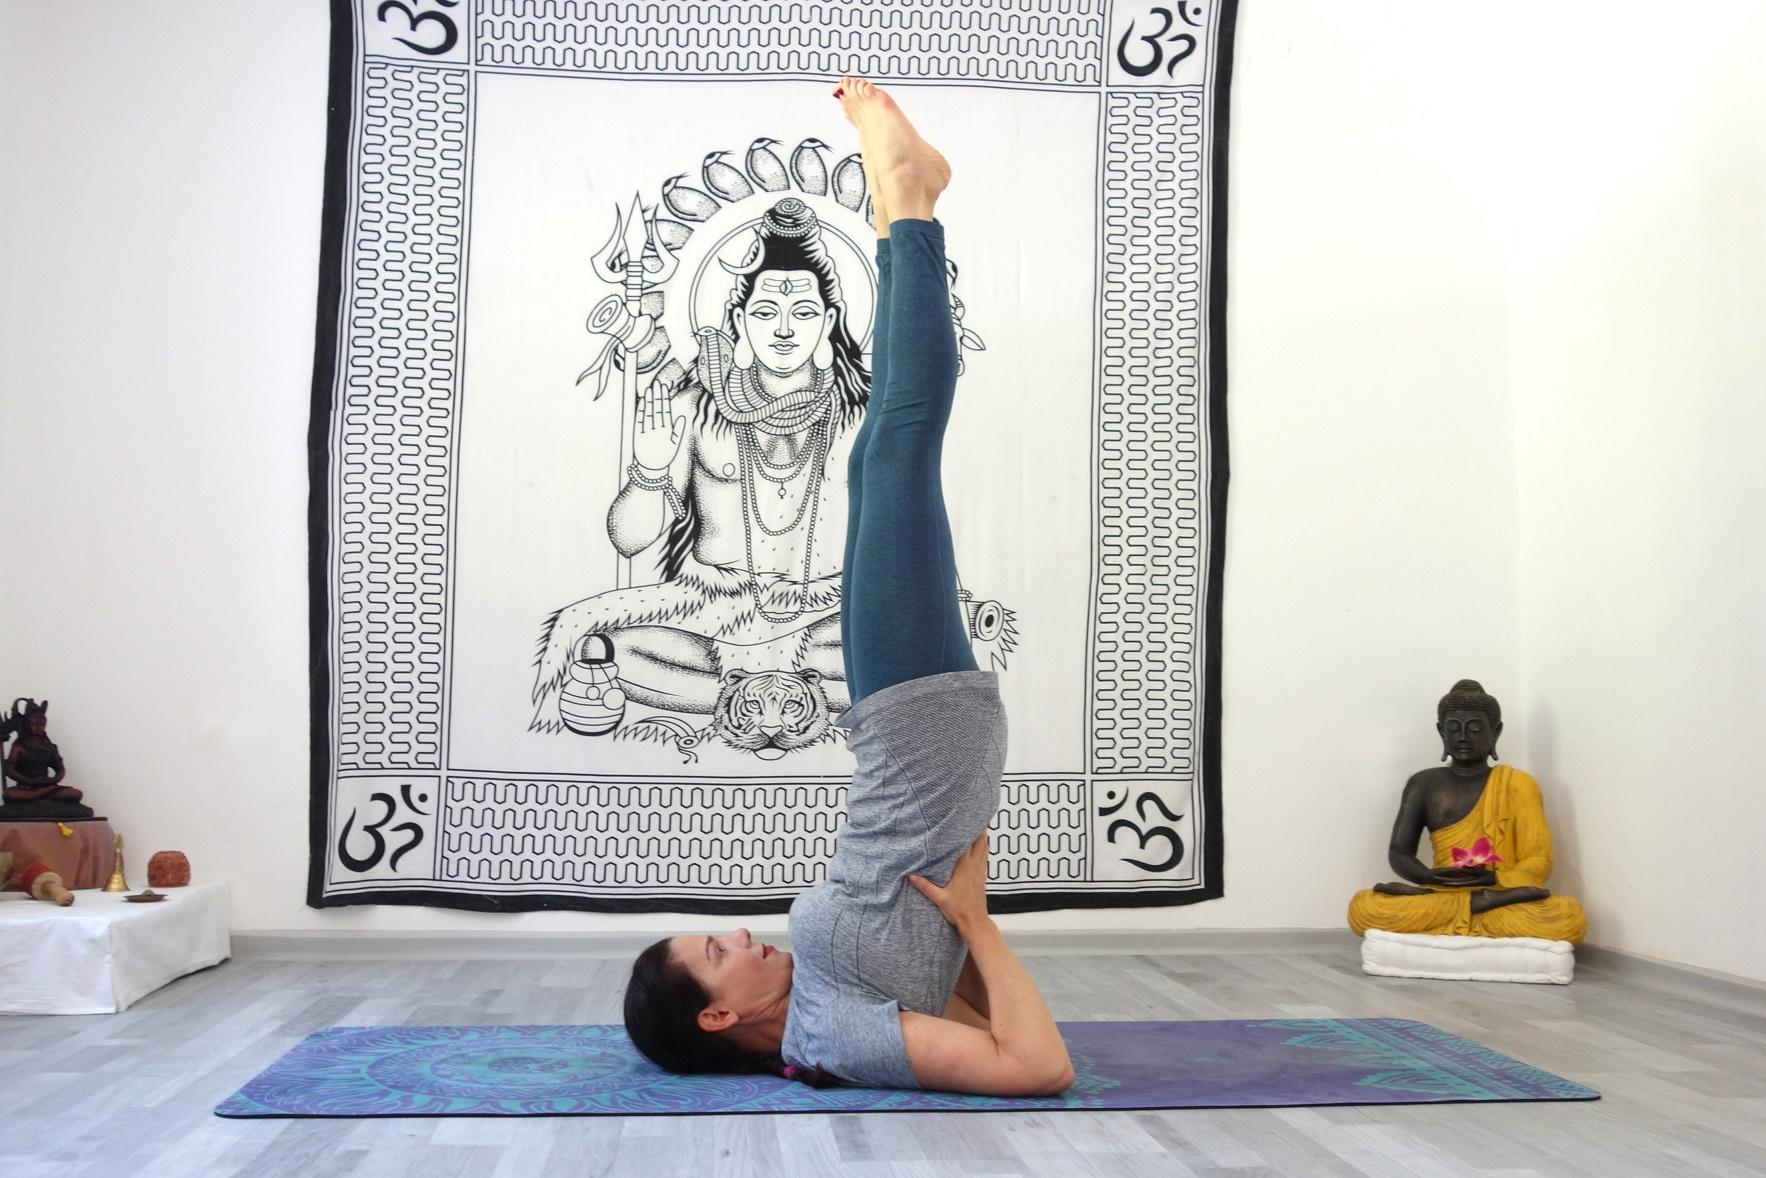 petra k 4 - Yoga für ein starkes Immunsystem